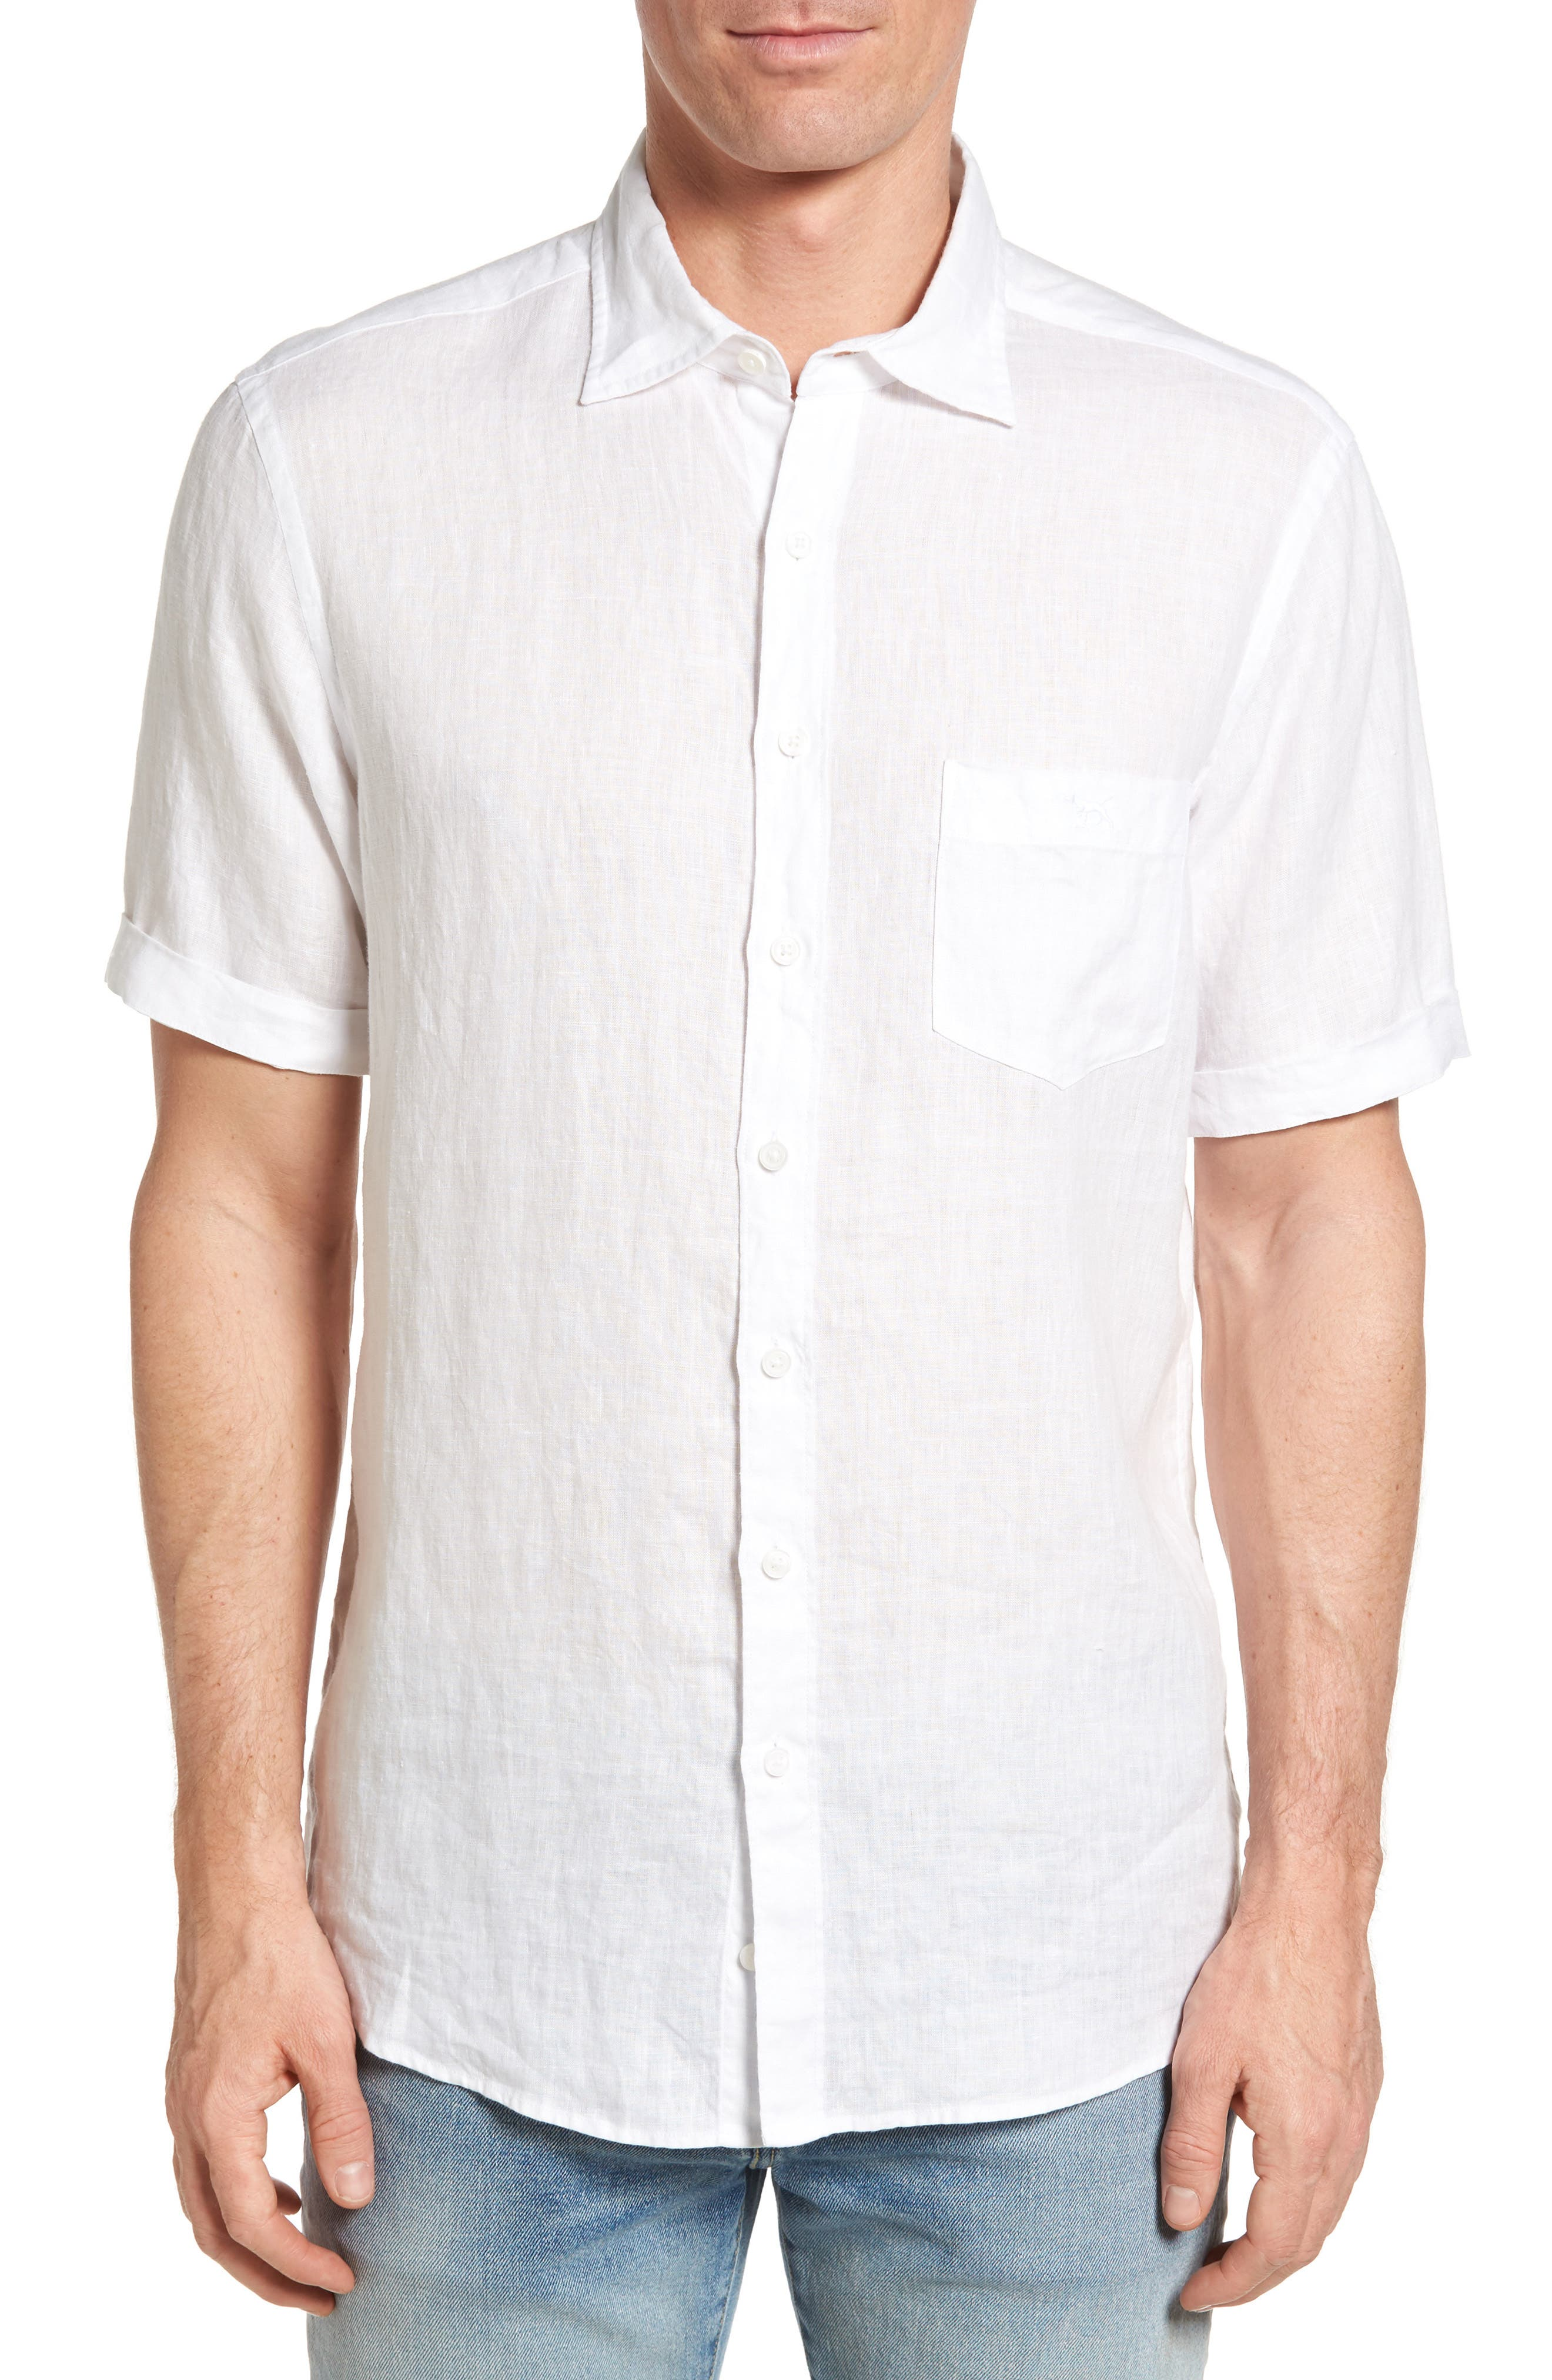 Abbotleight Linen Sport Shirt,                             Main thumbnail 1, color,                             SNOW